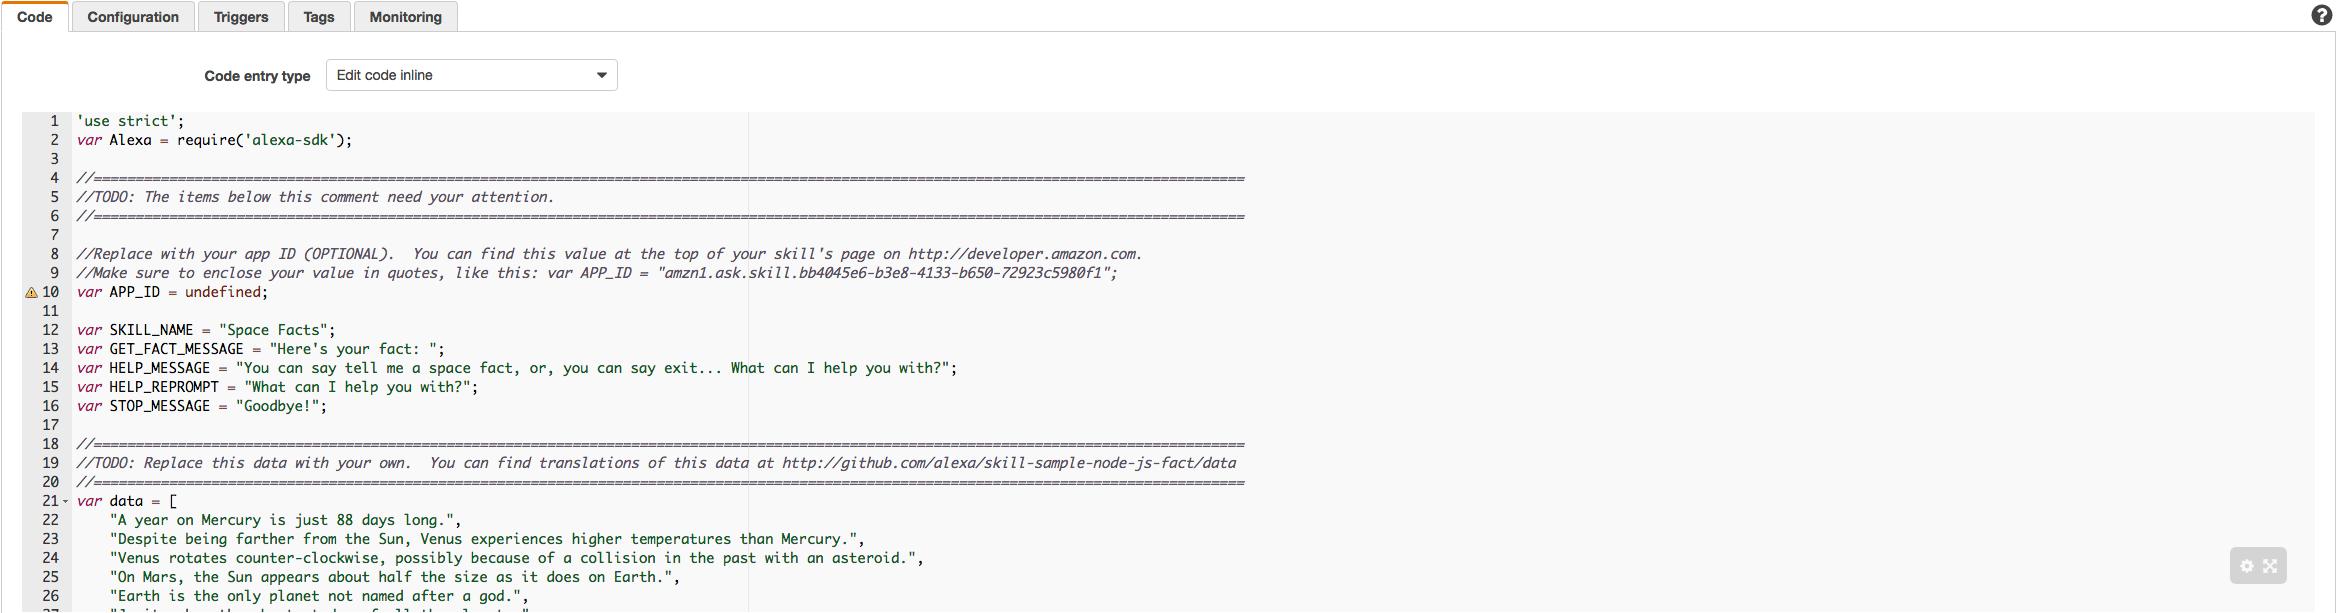 Lambda Code Box